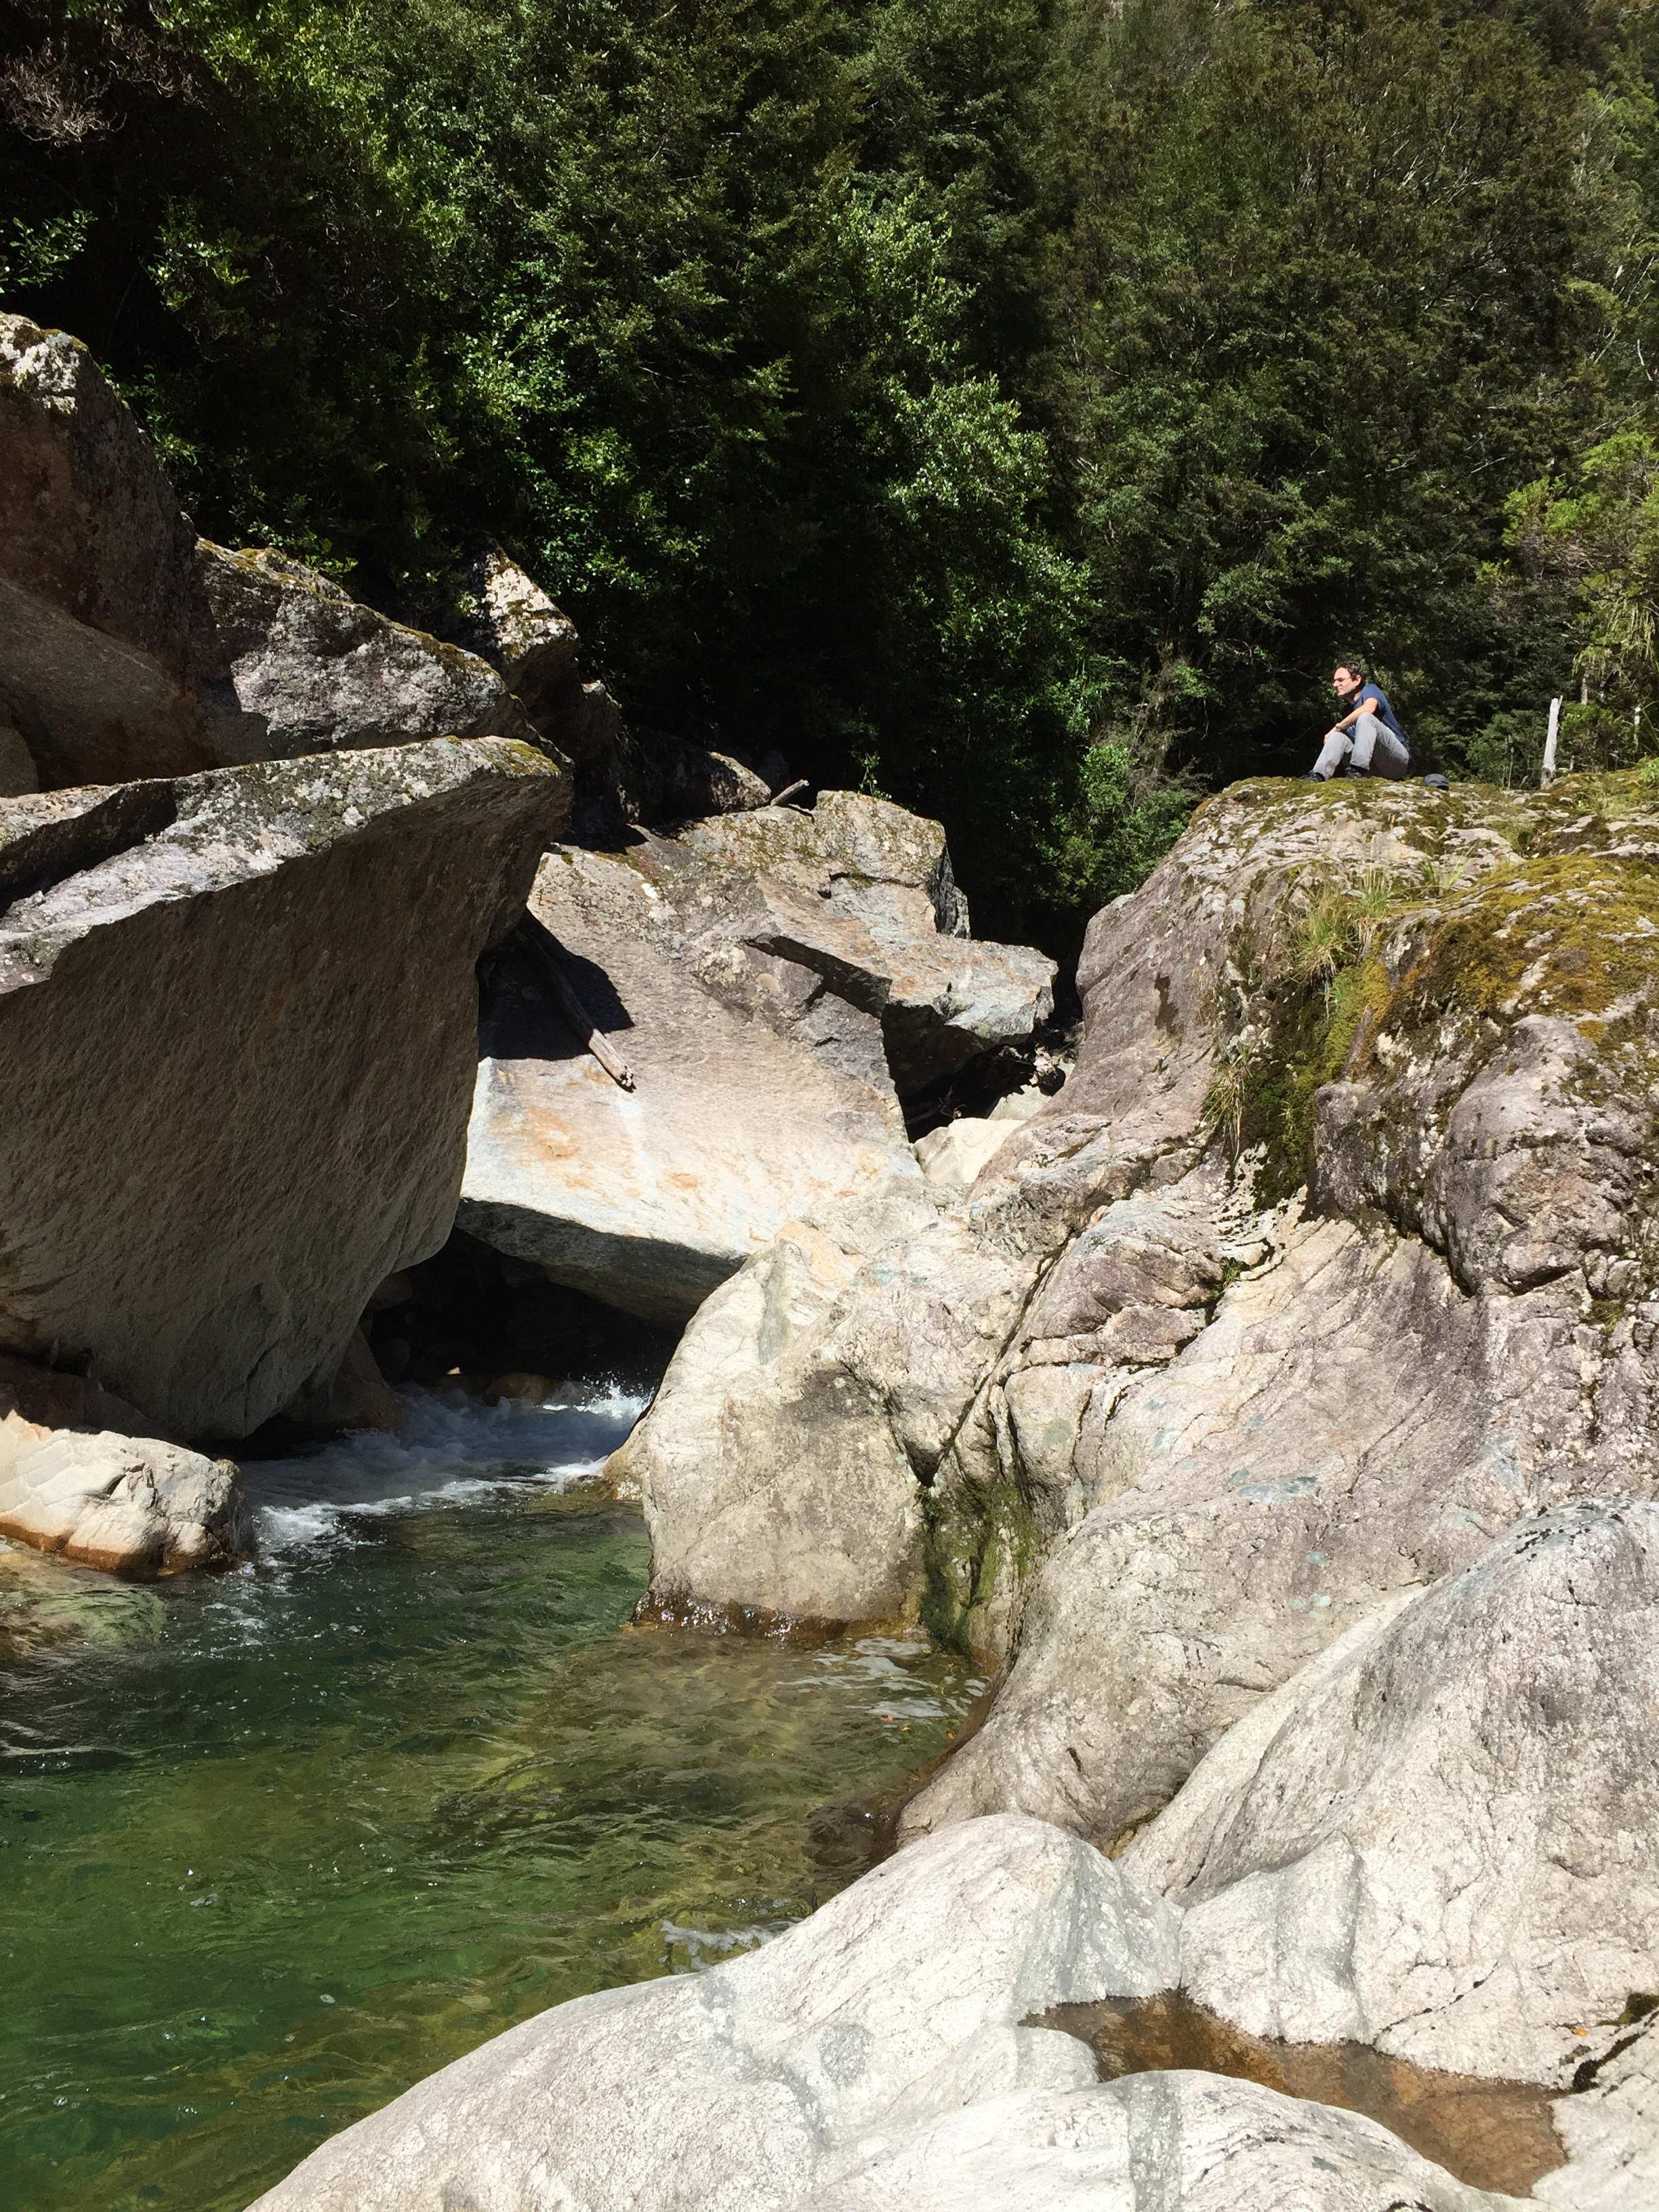 Below the Saxon Falls that we never saw